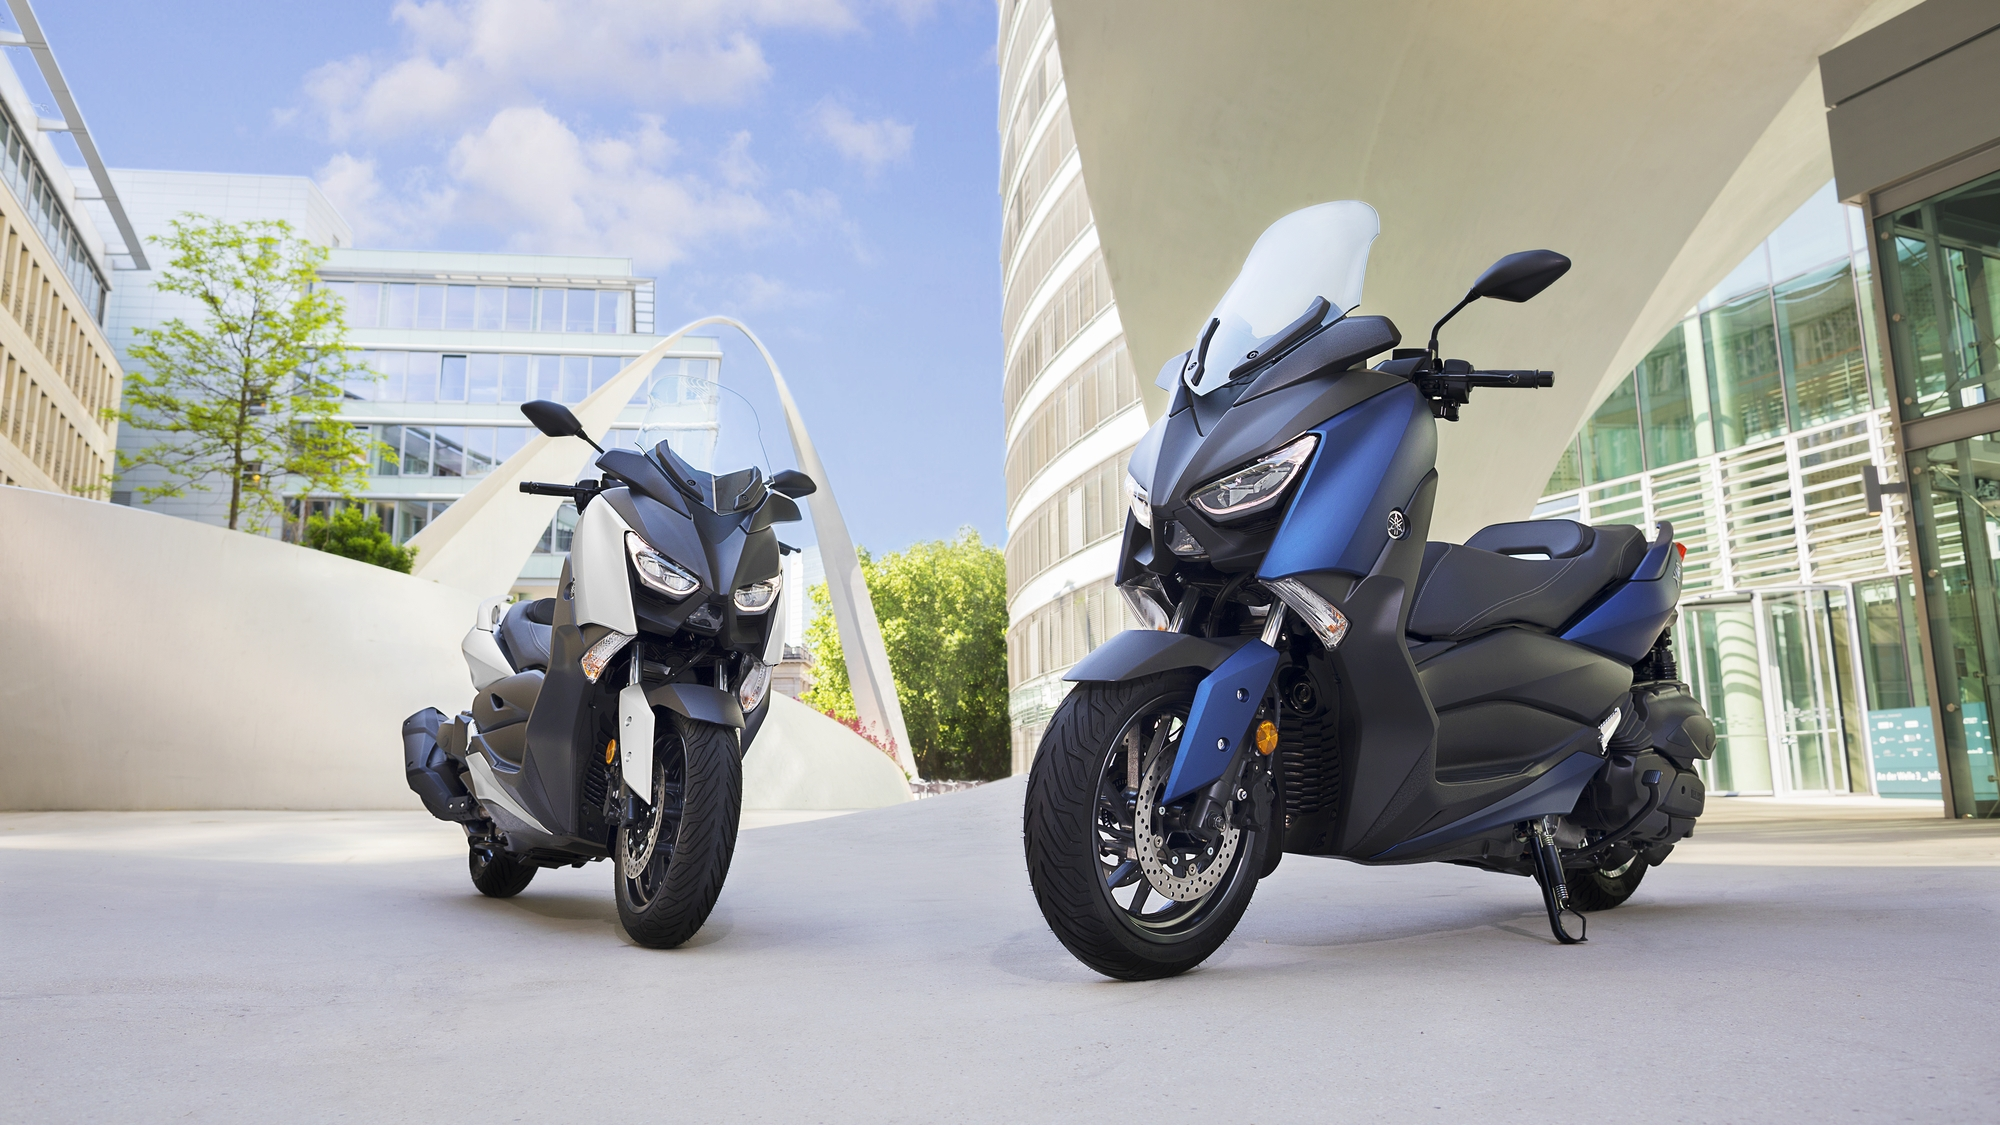 2018-Yamaha-X-MAX-400-EU-Phantom-Blue-Static-002